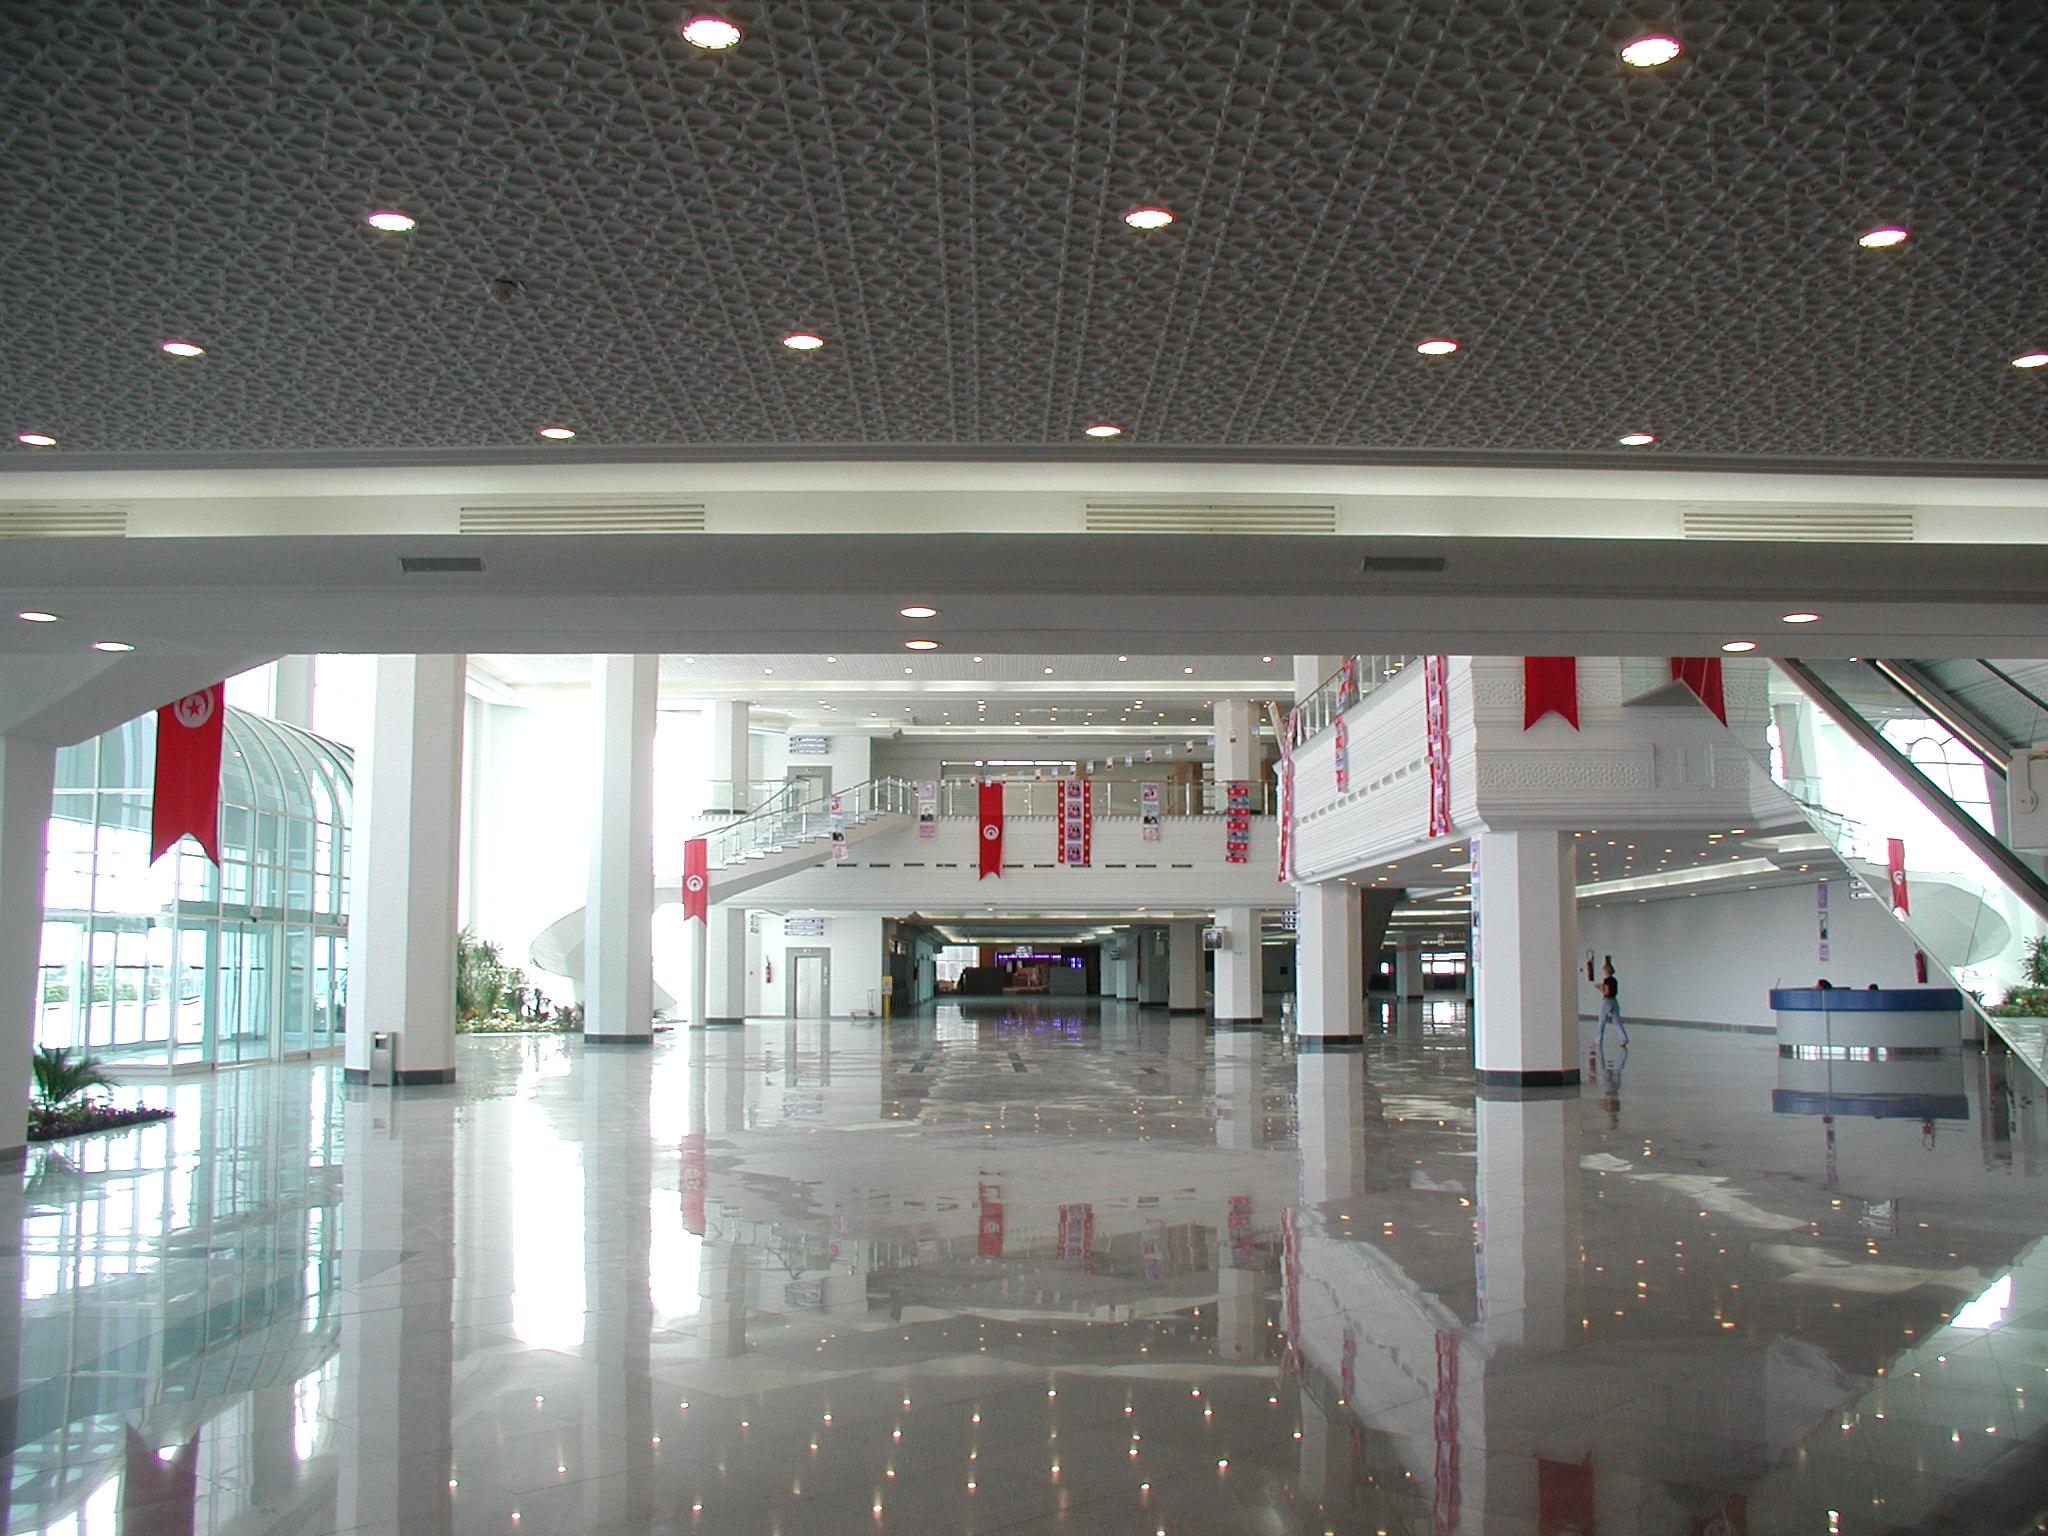 A roport international djerba zarzis - Office de l aviation civile et des aeroports tunisie ...